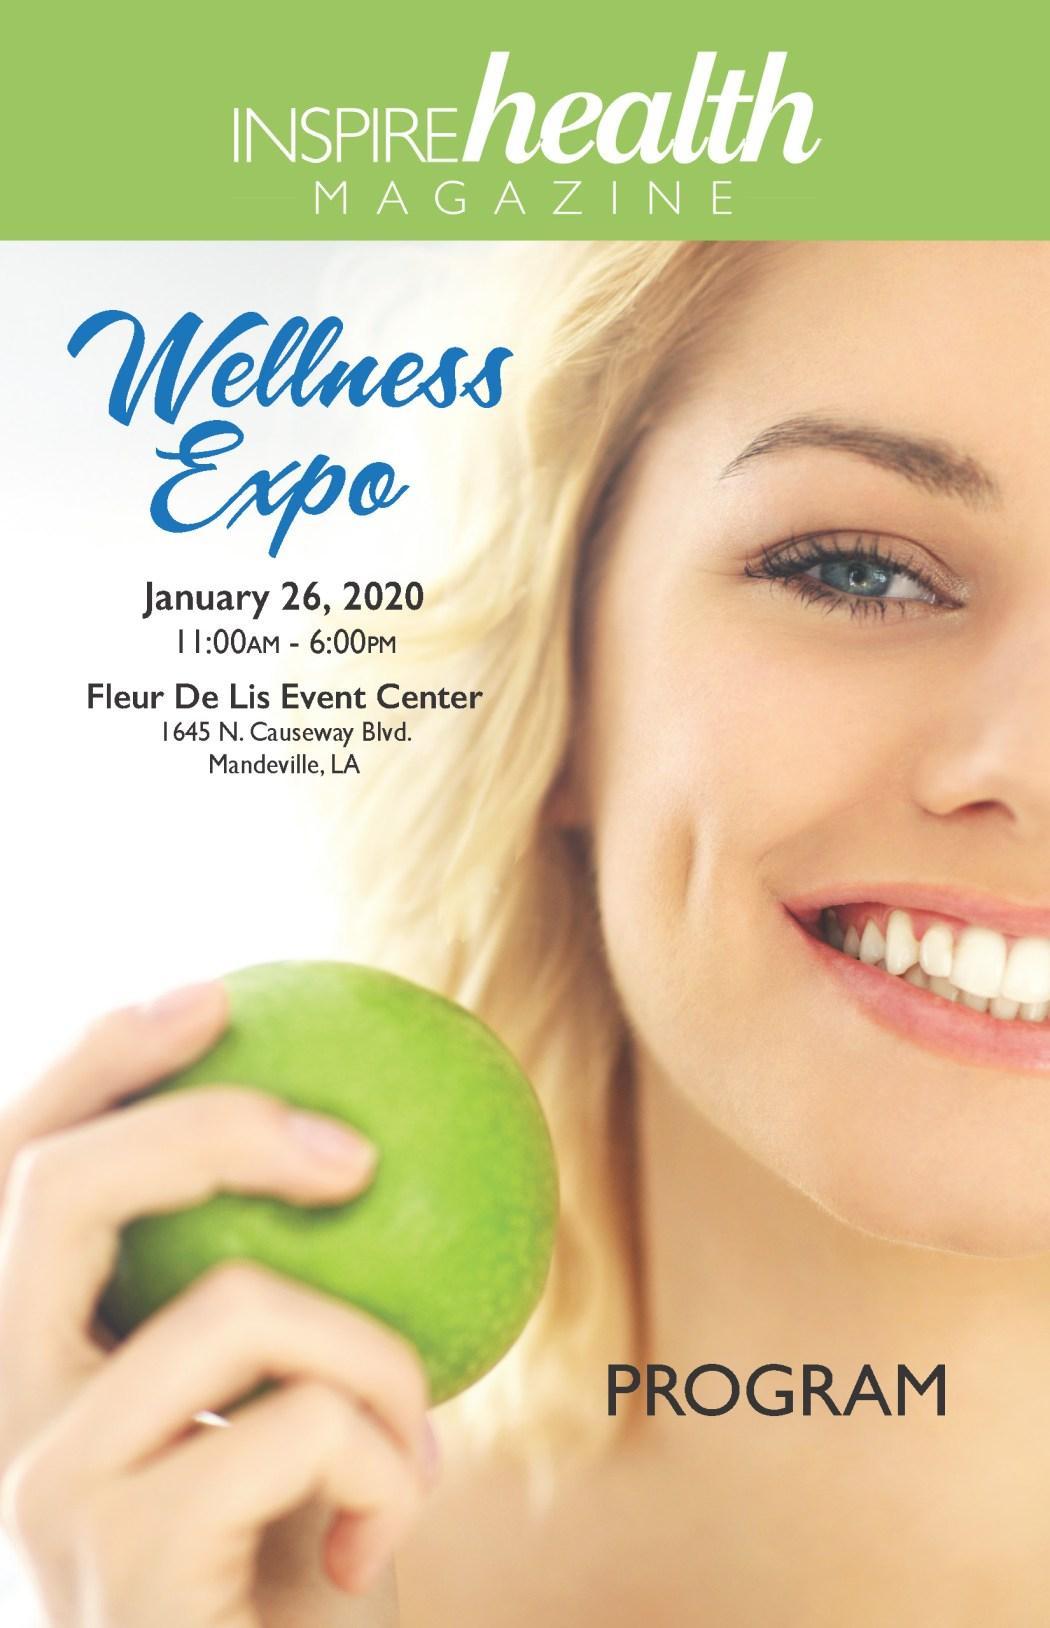 Inspire Health Magazine 2020 Wellness Expo Program